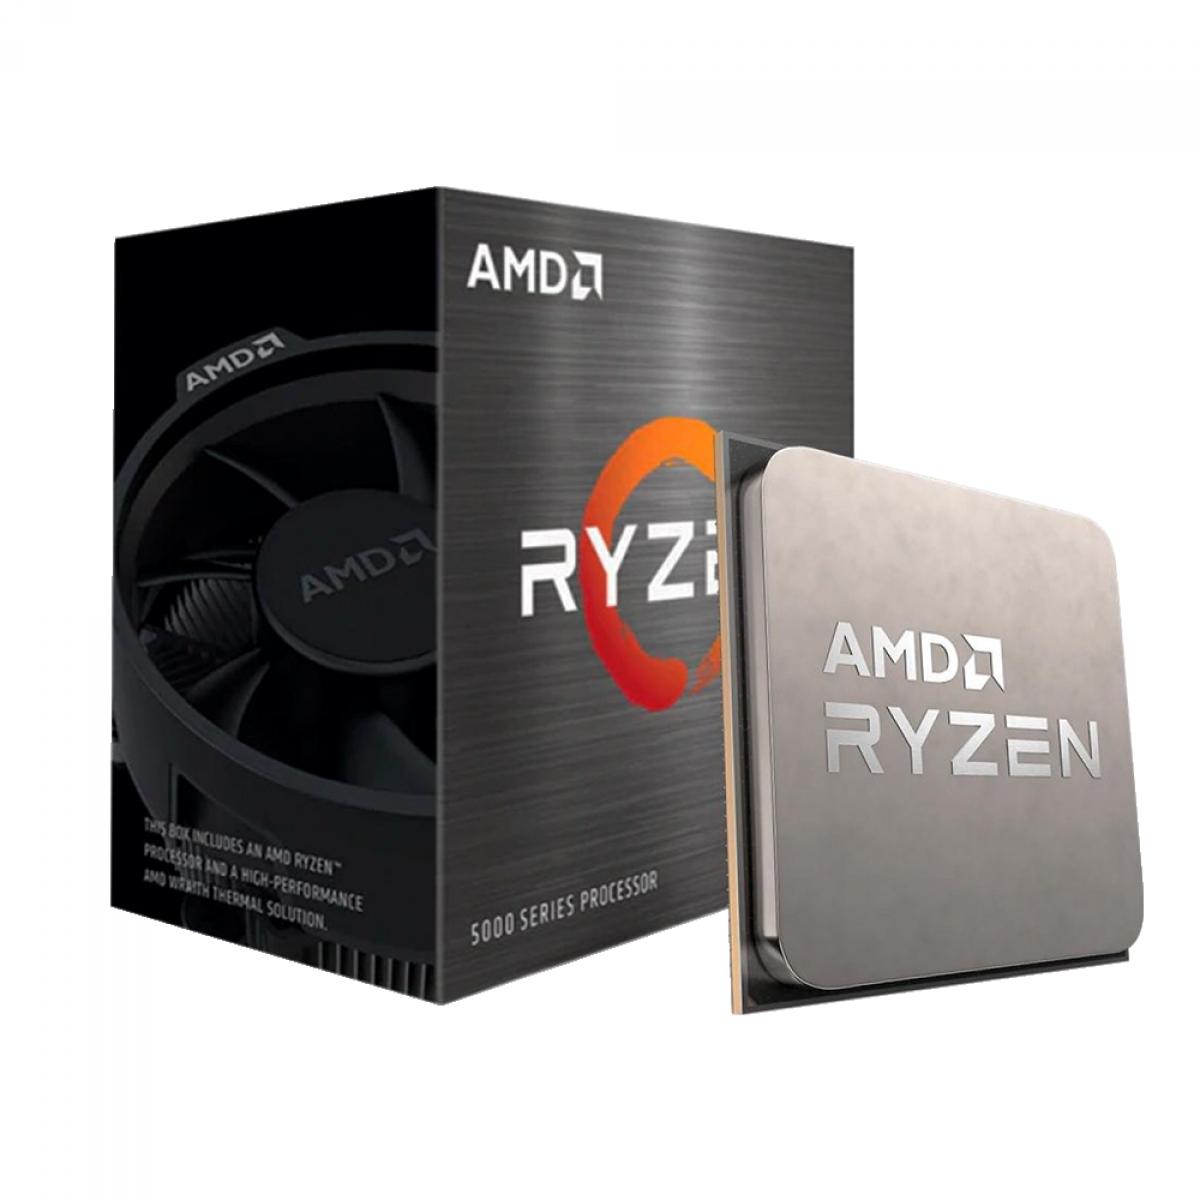 Kit Upgrade, MSI B550M PRO DASH + AMD Ryzen 7 5700G